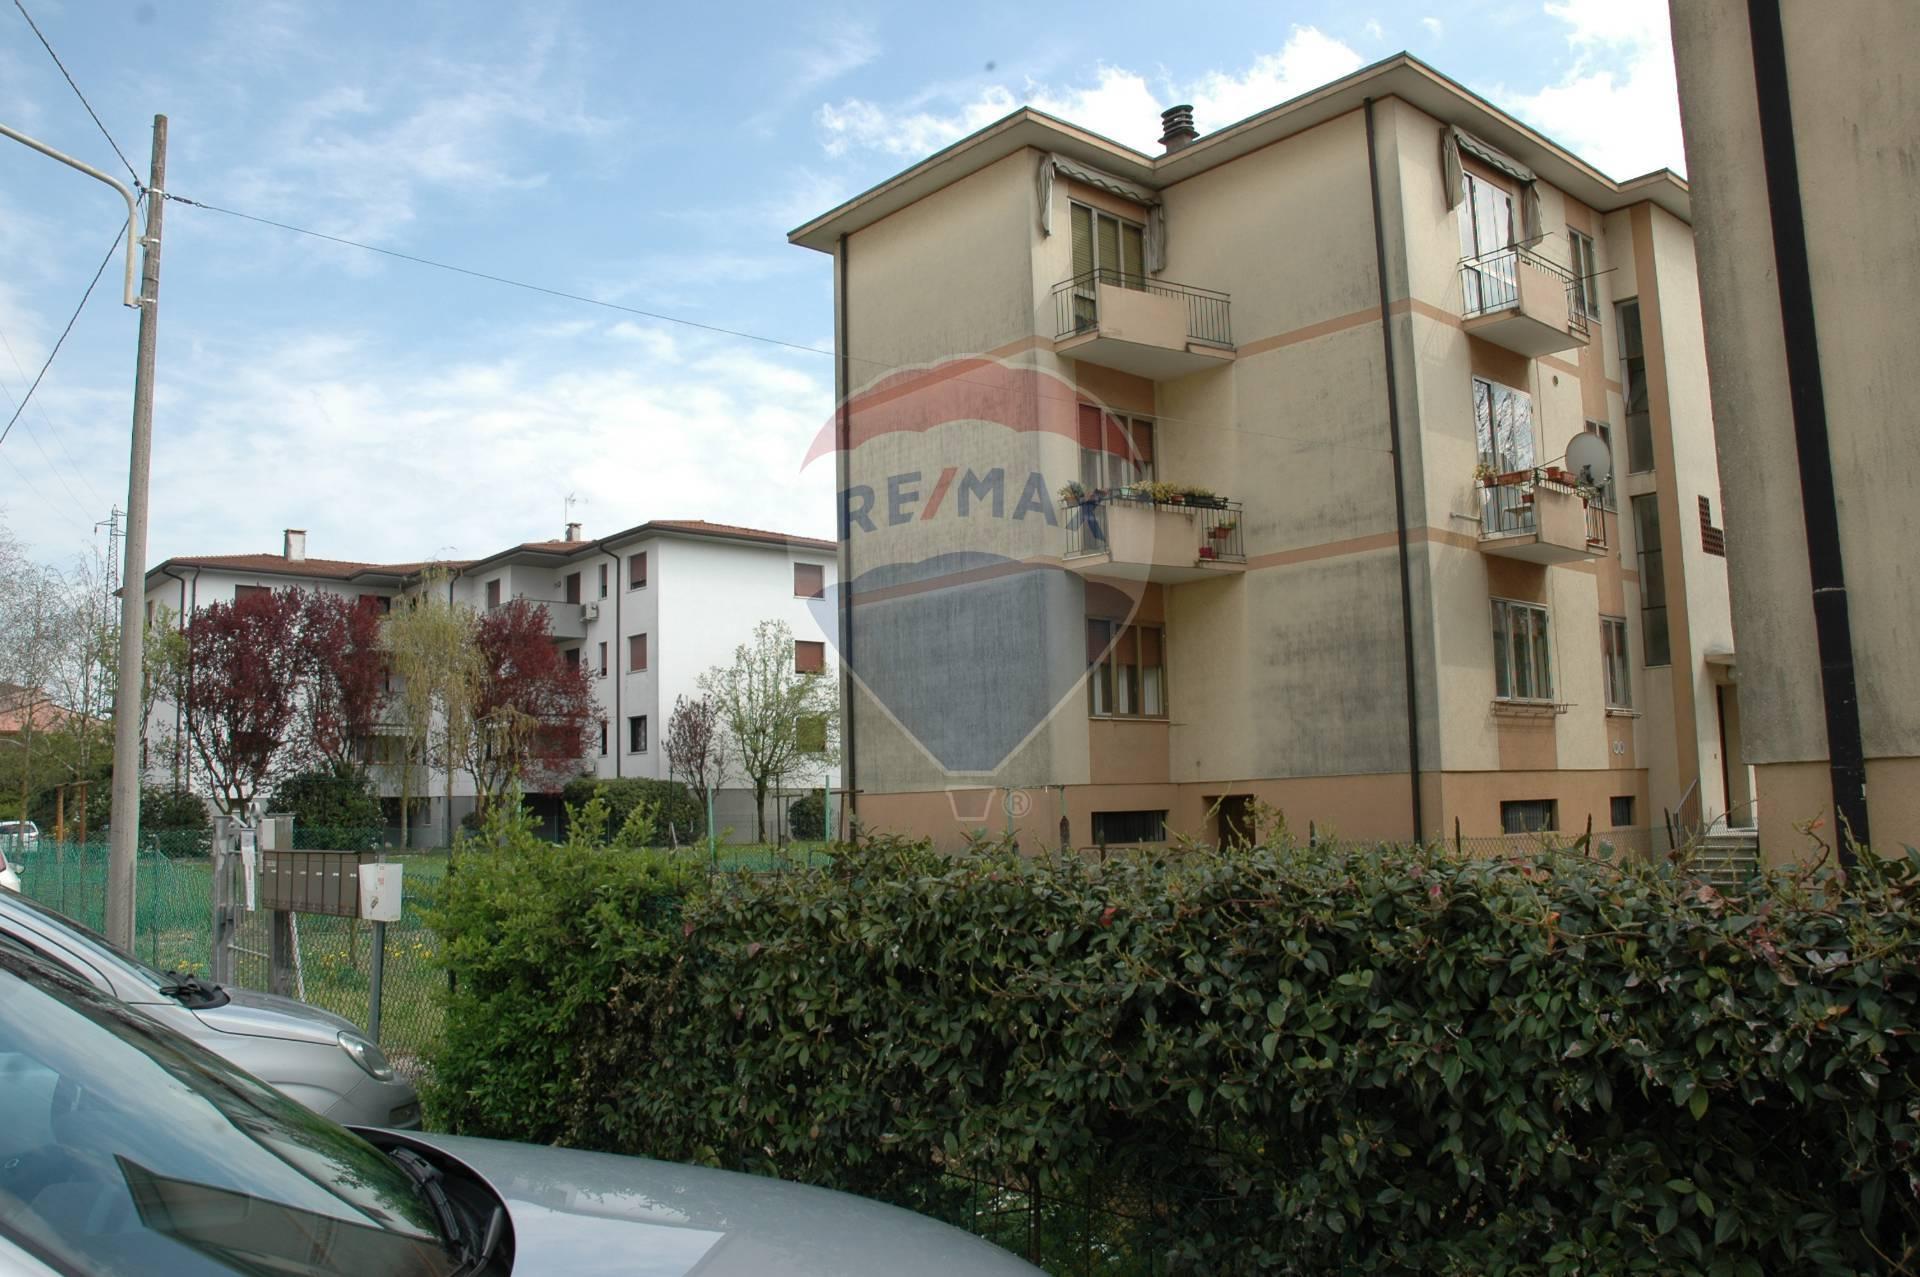 vicenza vendita quart: s.pio x-stanga-cà balbi re-max-palladio